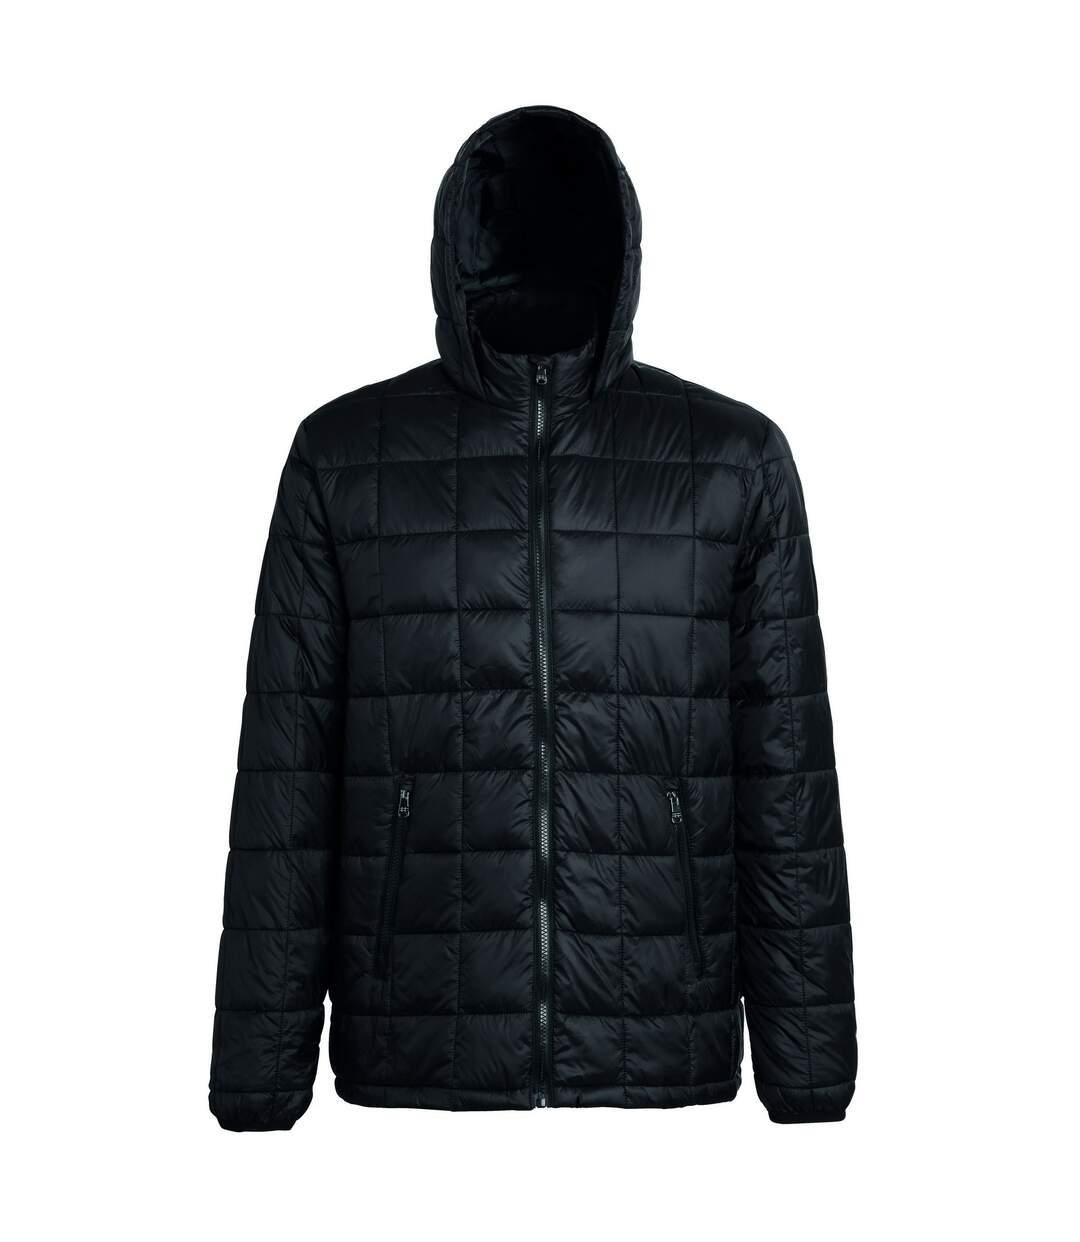 2786 Mens Box Quilt Hooded Zip Up Jacket (Black) - UTRW5263